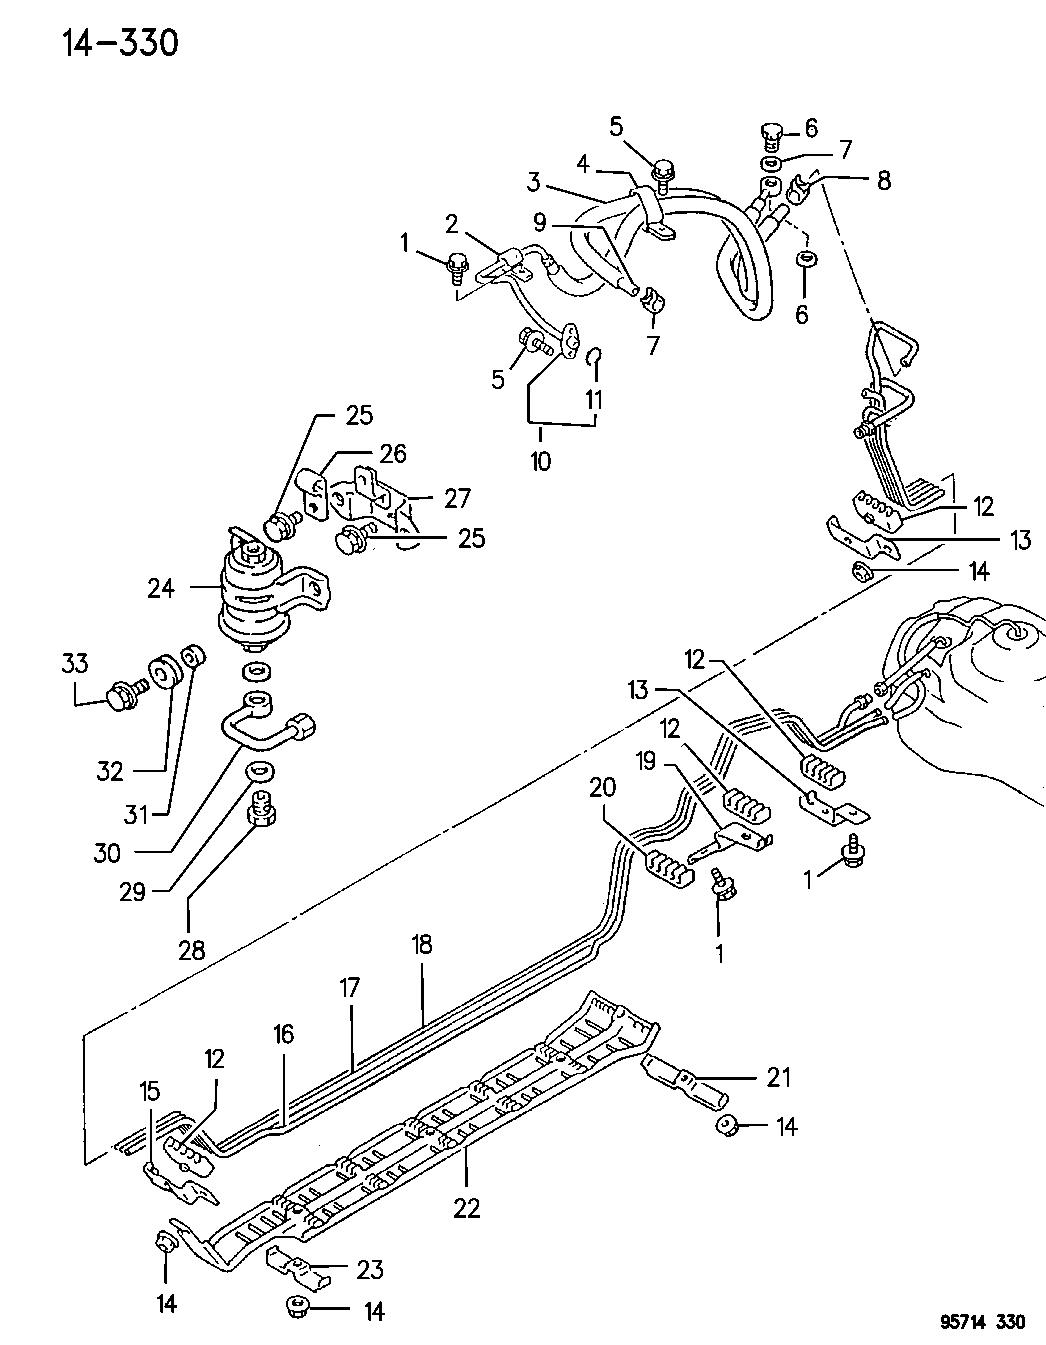 mb165037